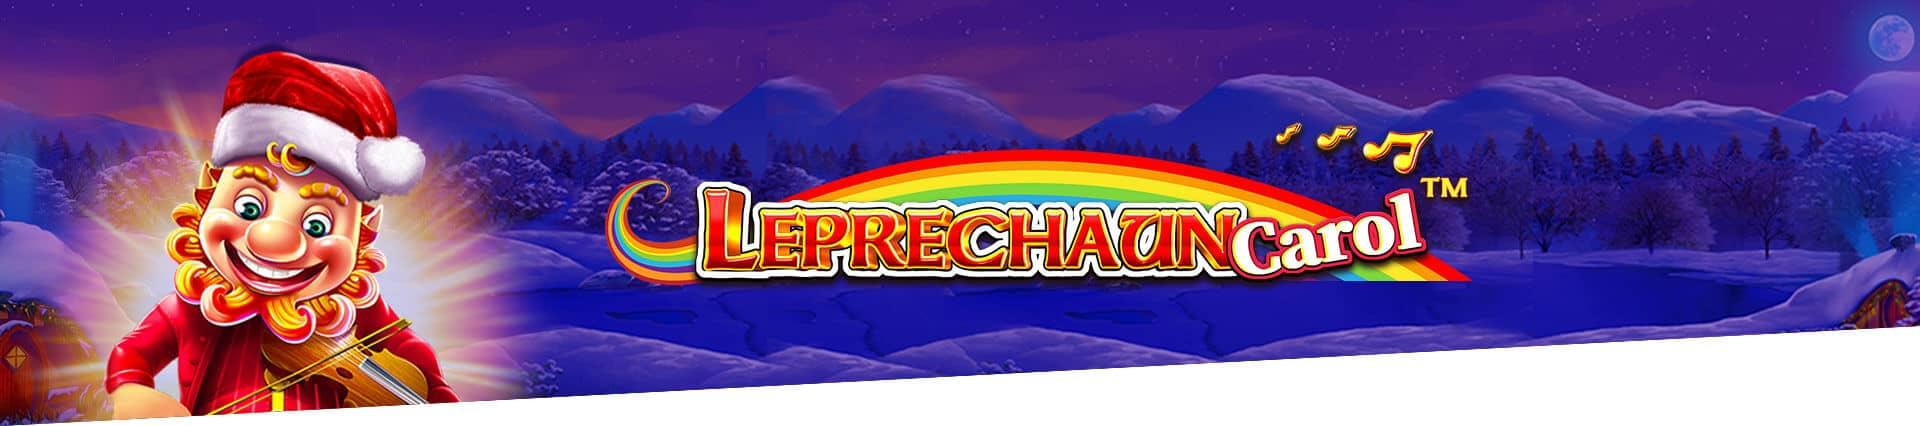 Leprechaun Carol free online